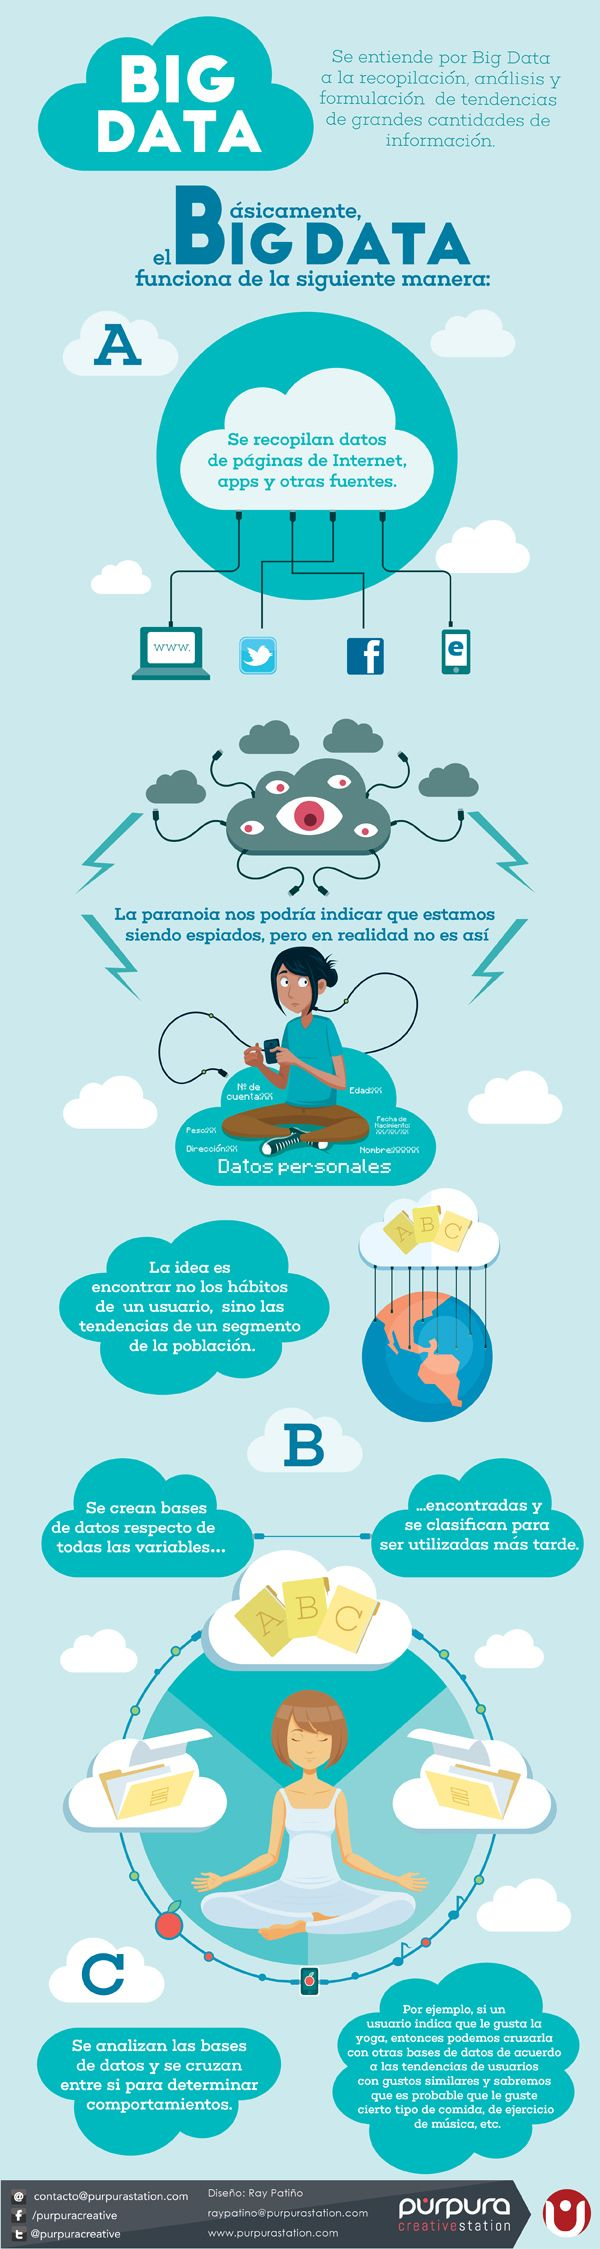 ABC del Big Data #infografia